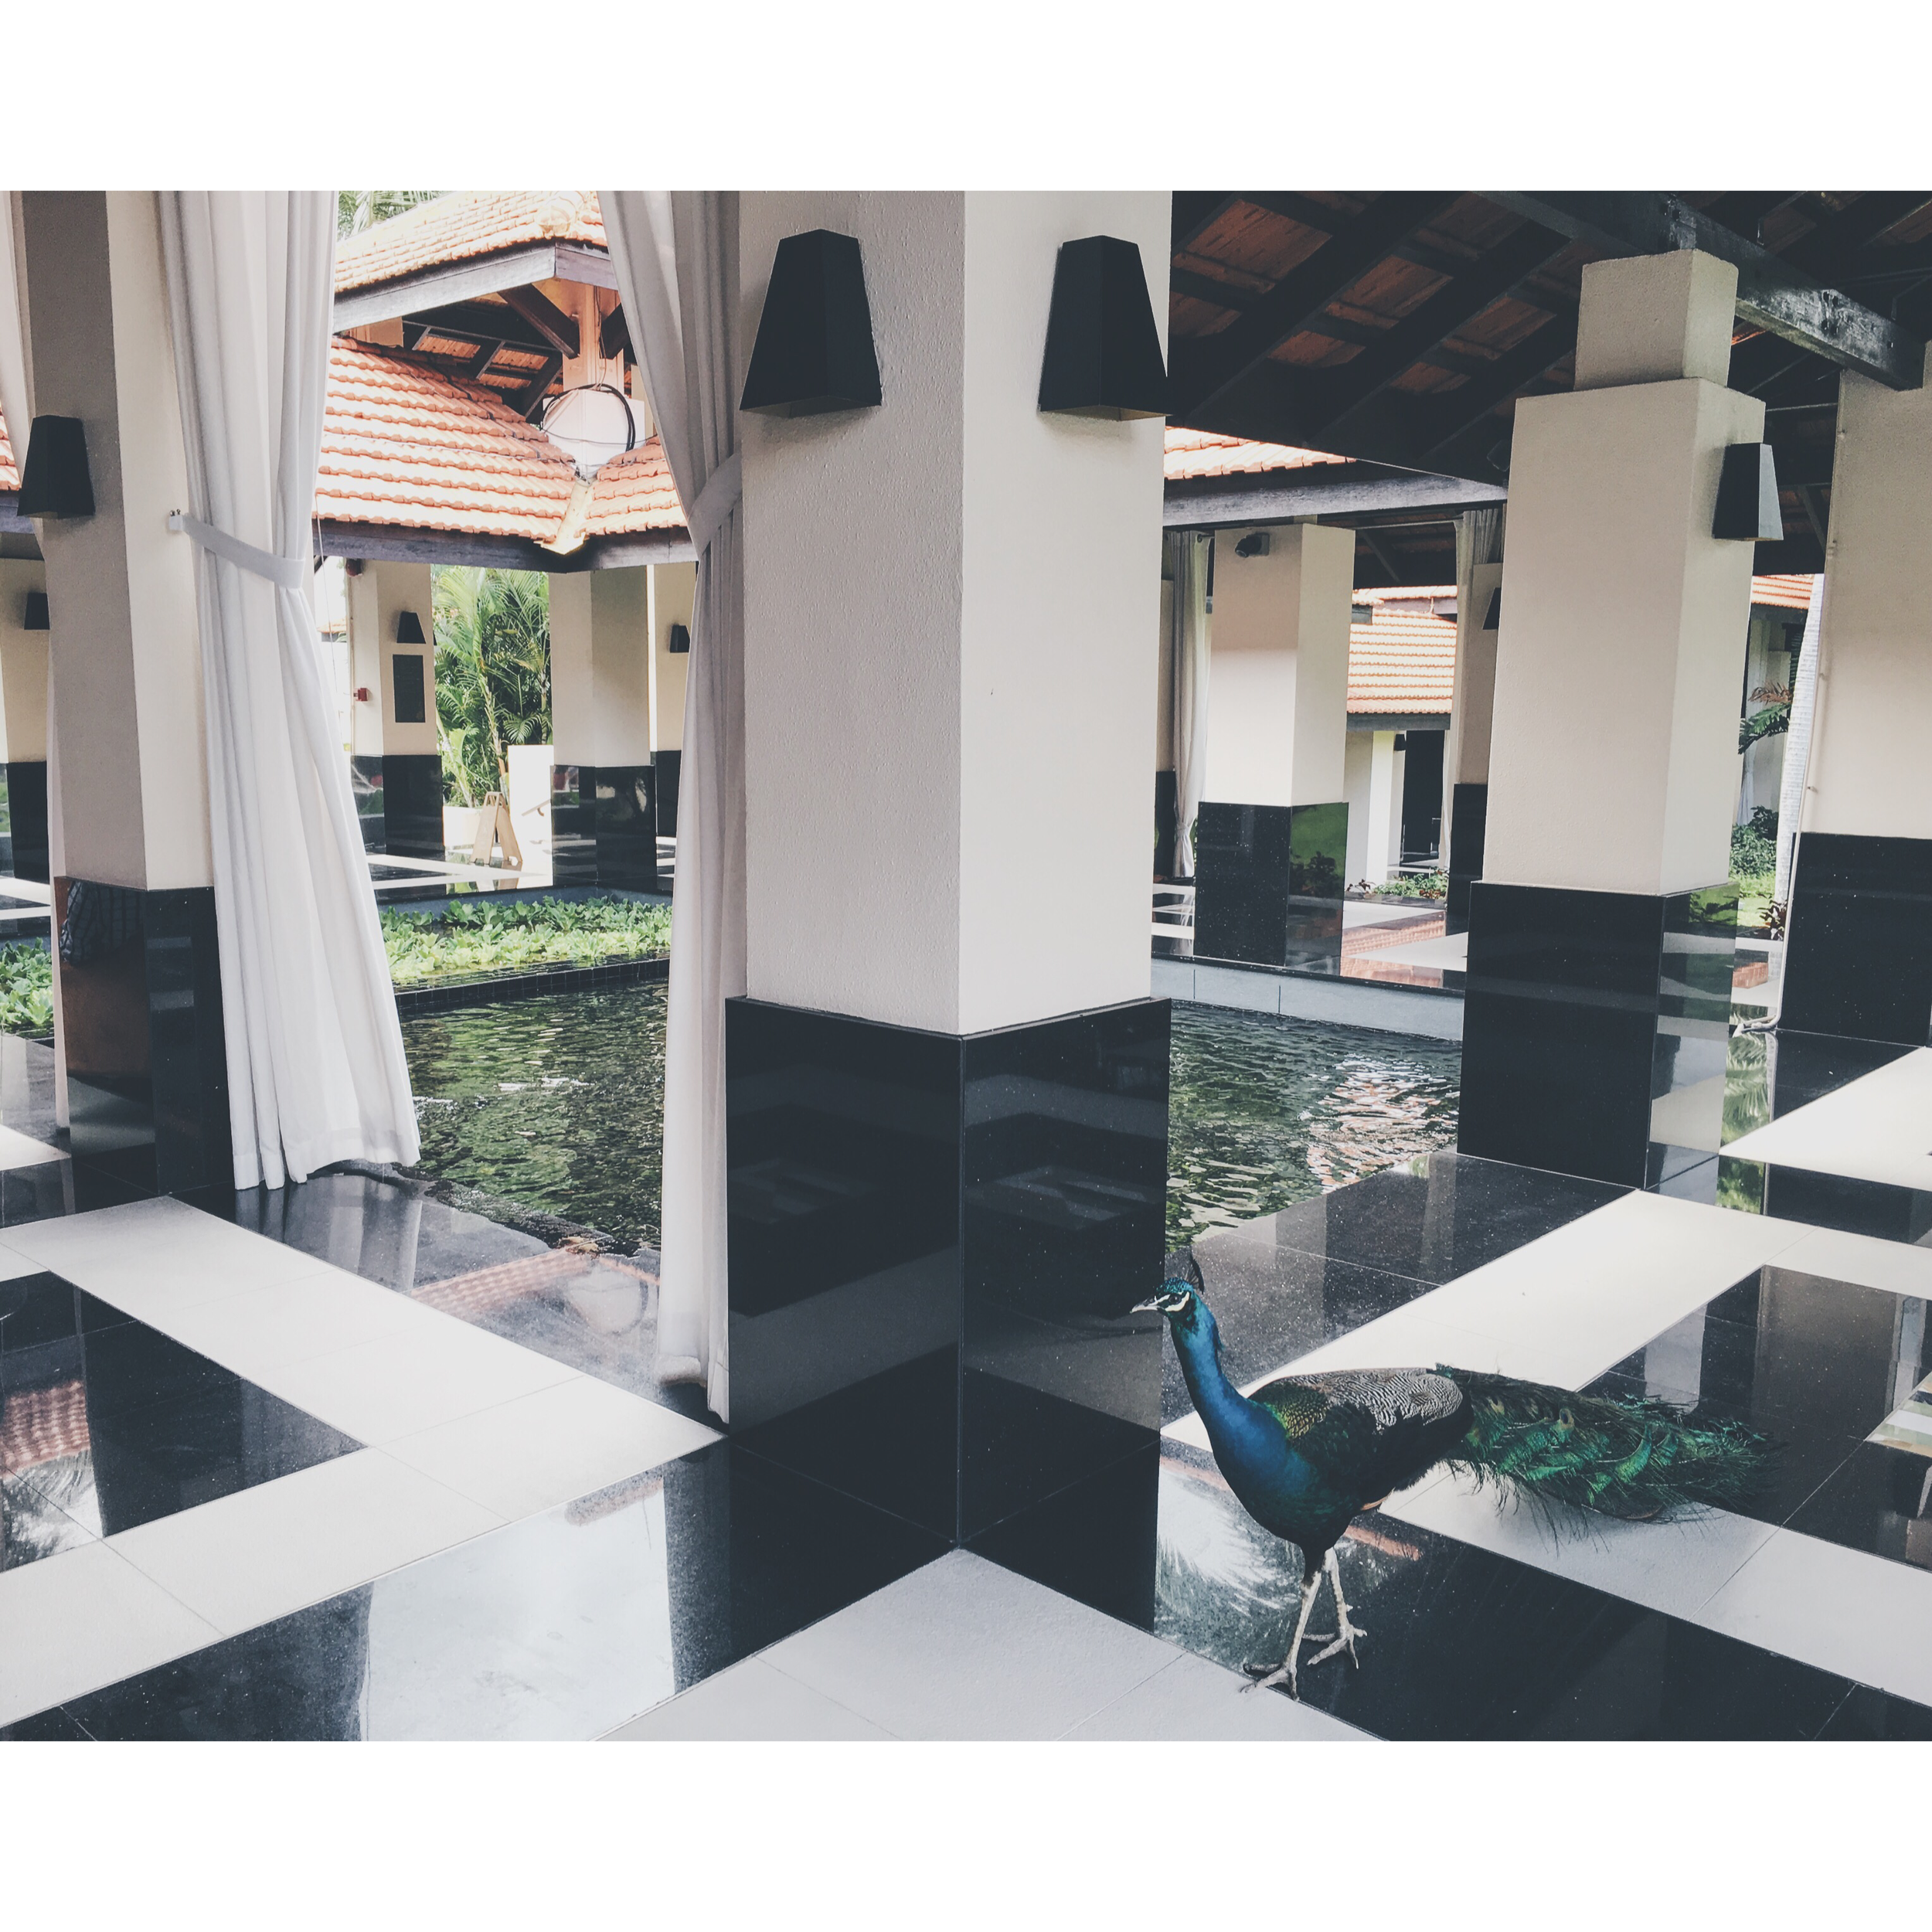 Sofitel Lounge on Sentosa